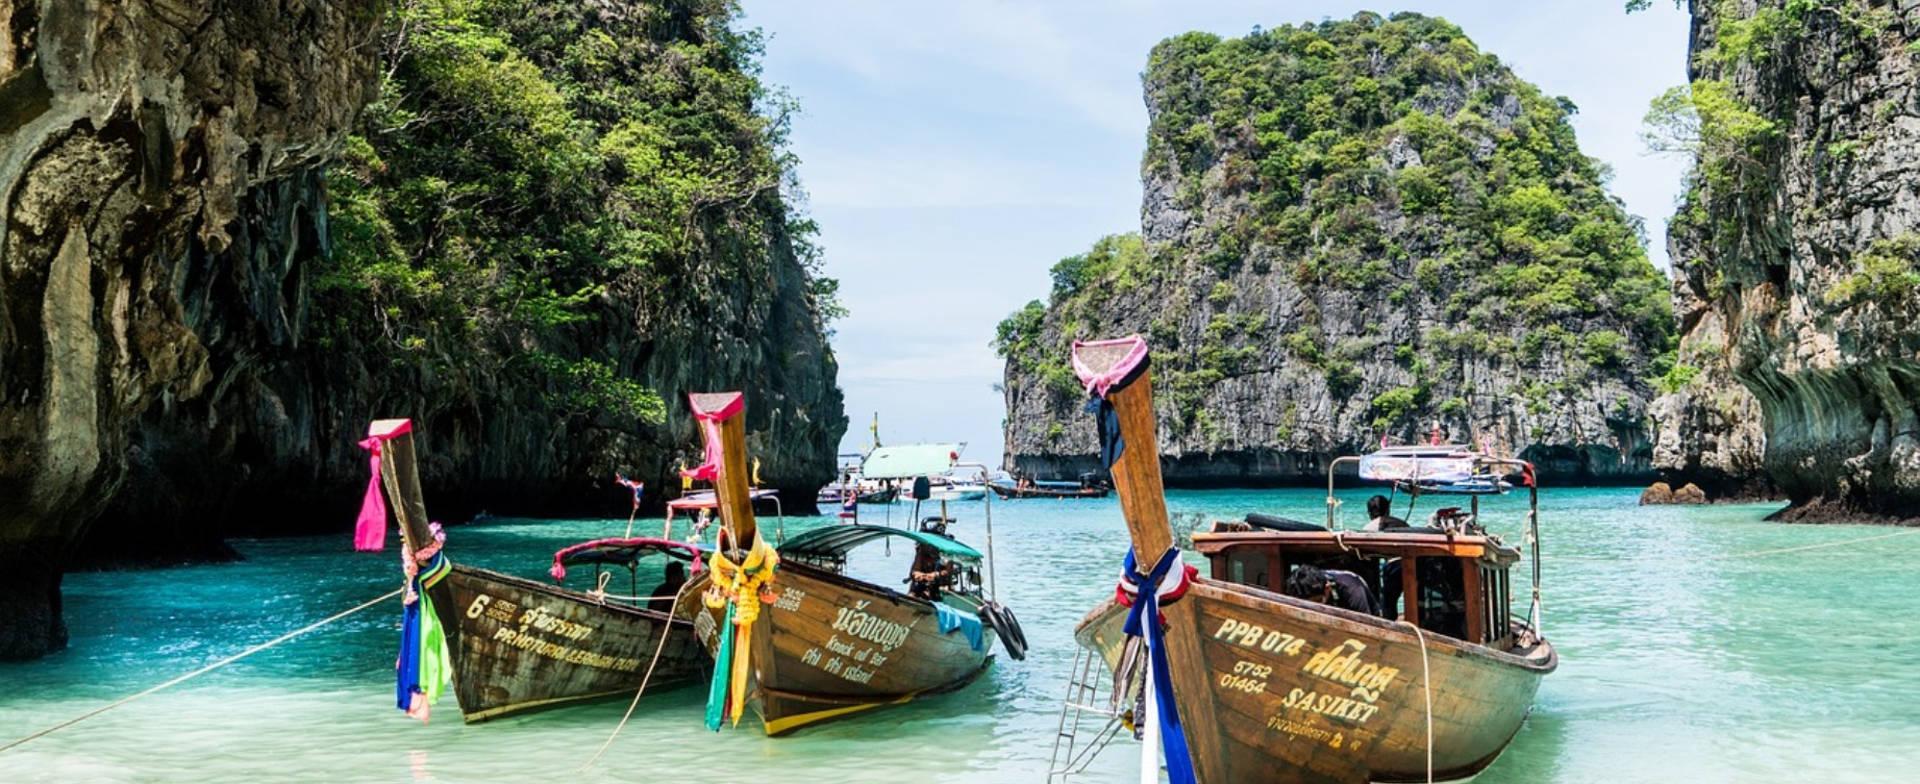 Asien Thailand Tehighland Bangkok Bang Monument Valley die reise reisen bielefeld reisebuero Wellnessreisen Familienreisen Kreuzfahrten Lastminute Mietwagen Lastminute